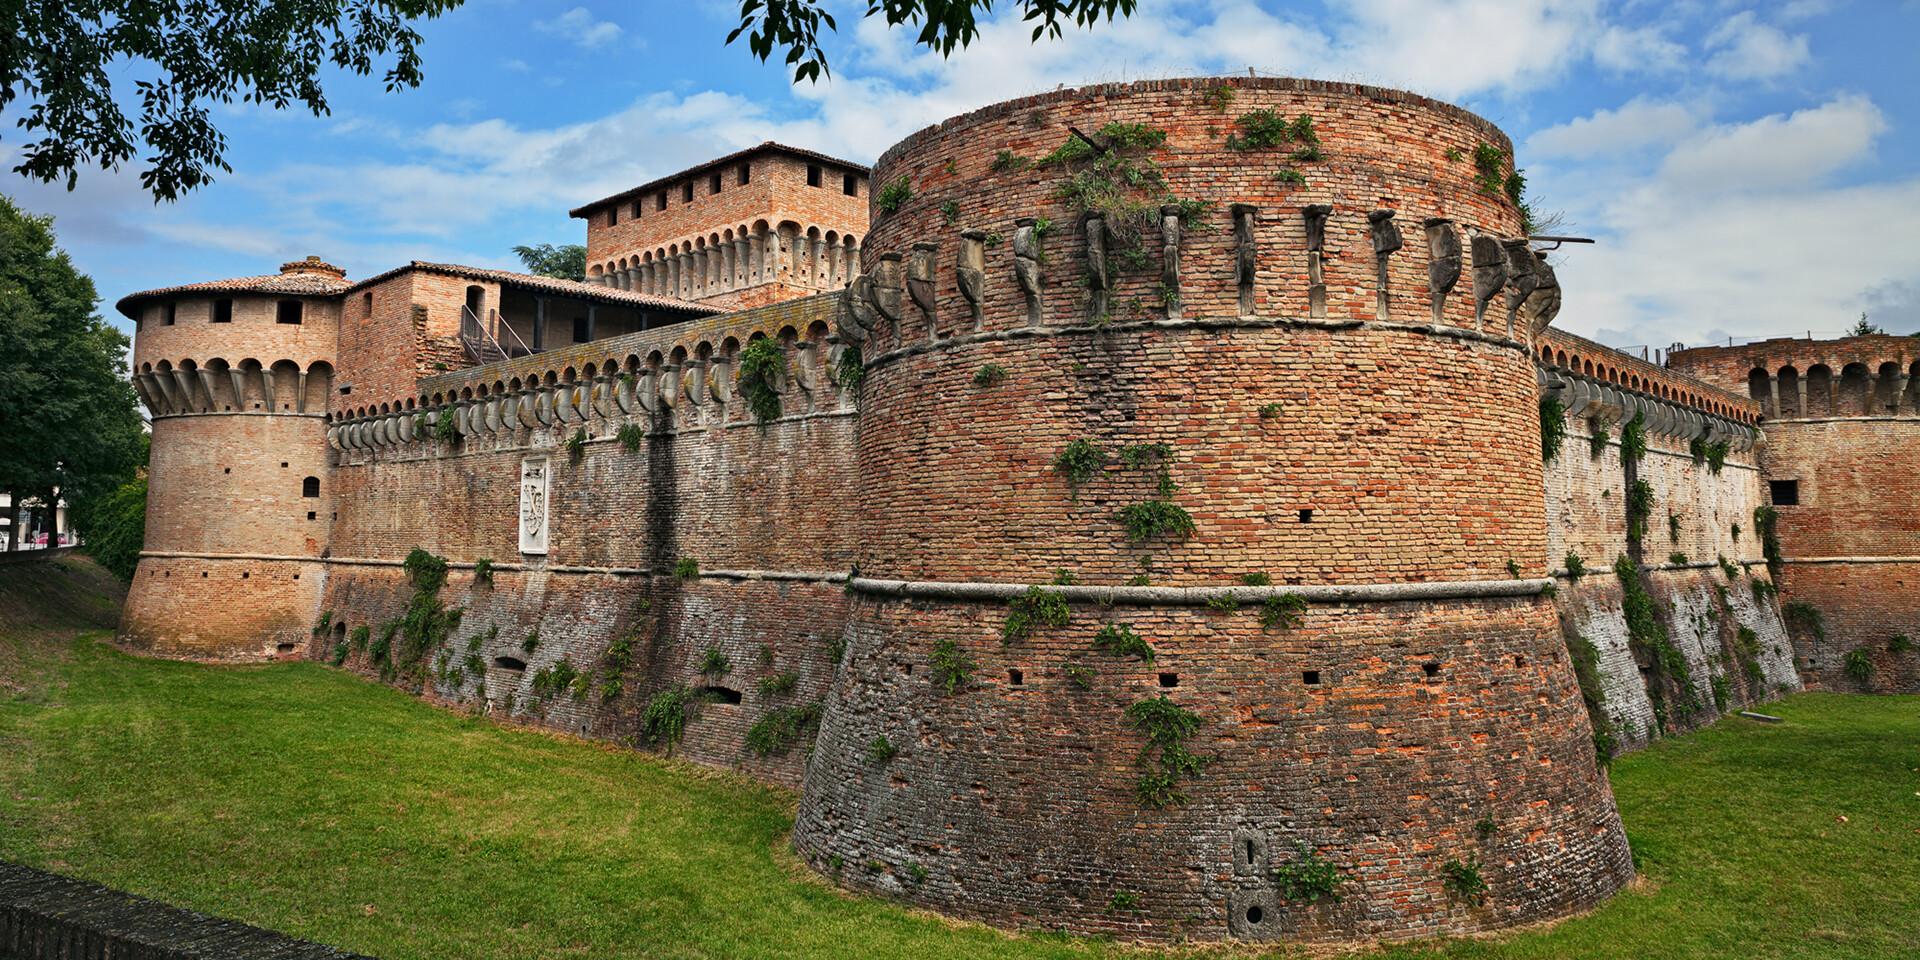 Filiale di Romagna